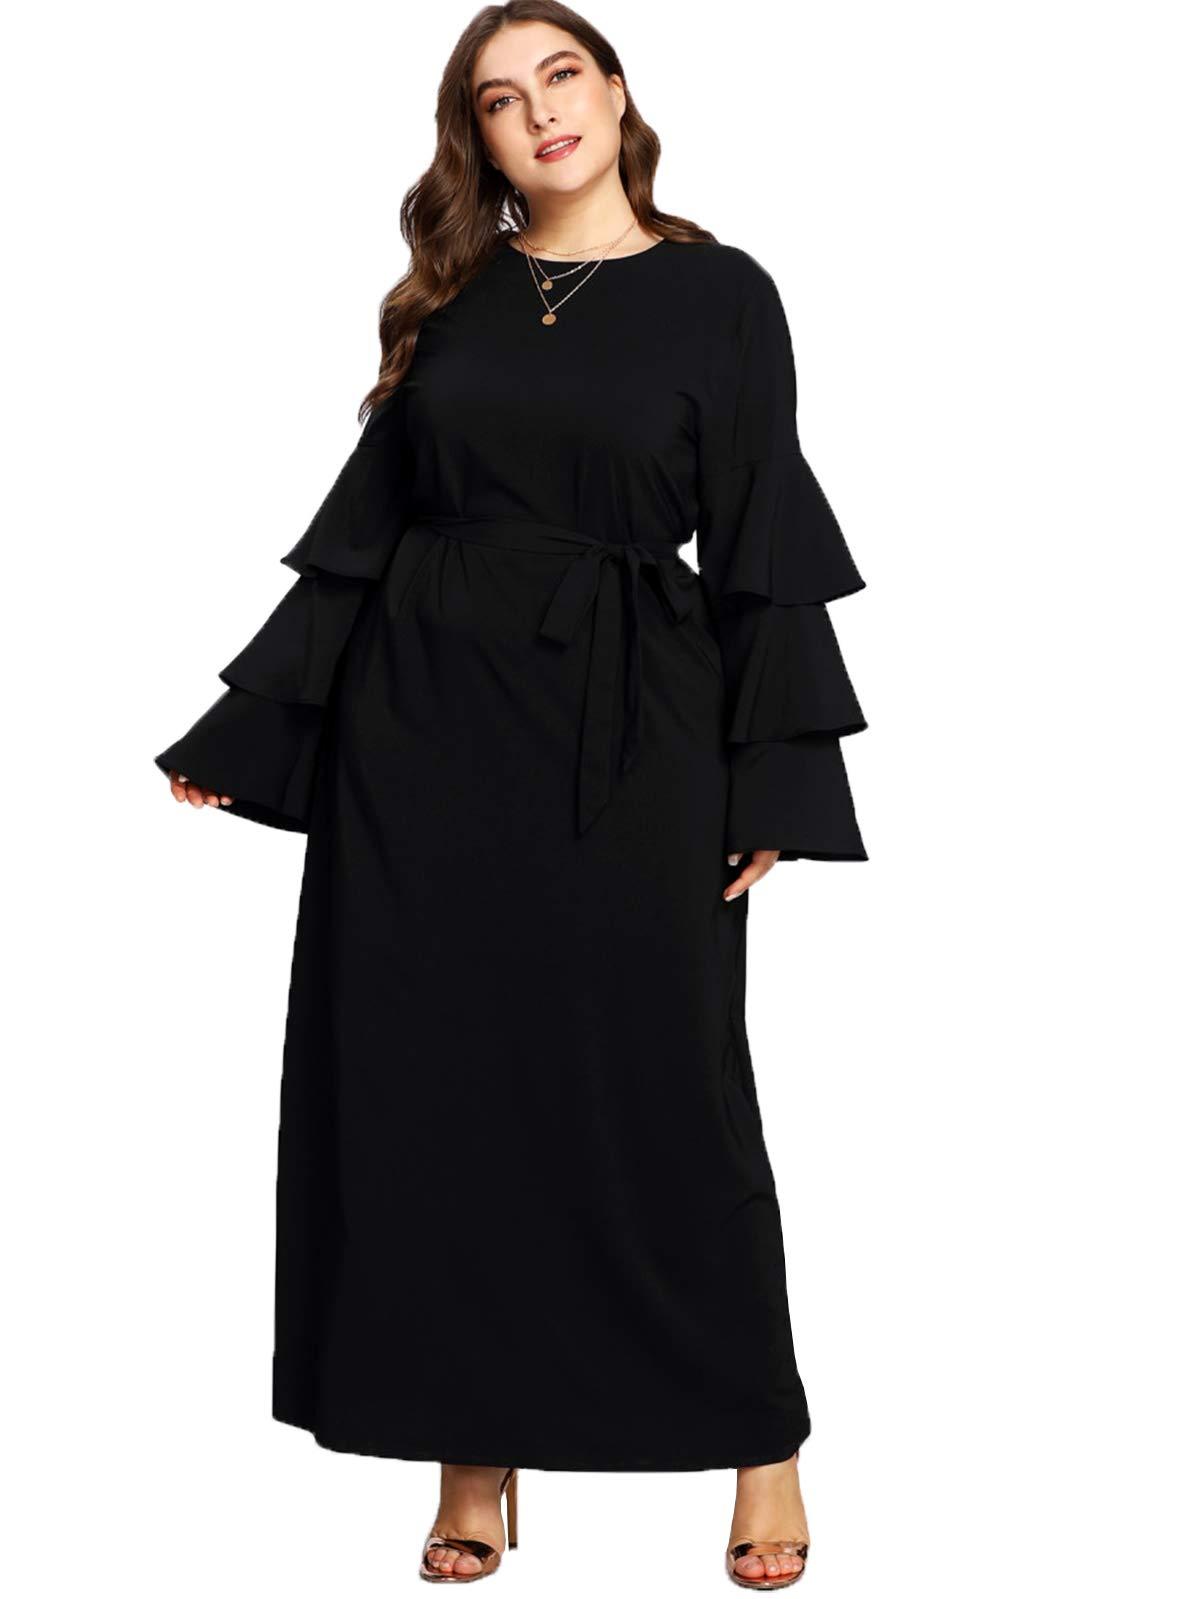 52f72c6c3f6 Plus Size Maxi Dresses In Black - Data Dynamic AG